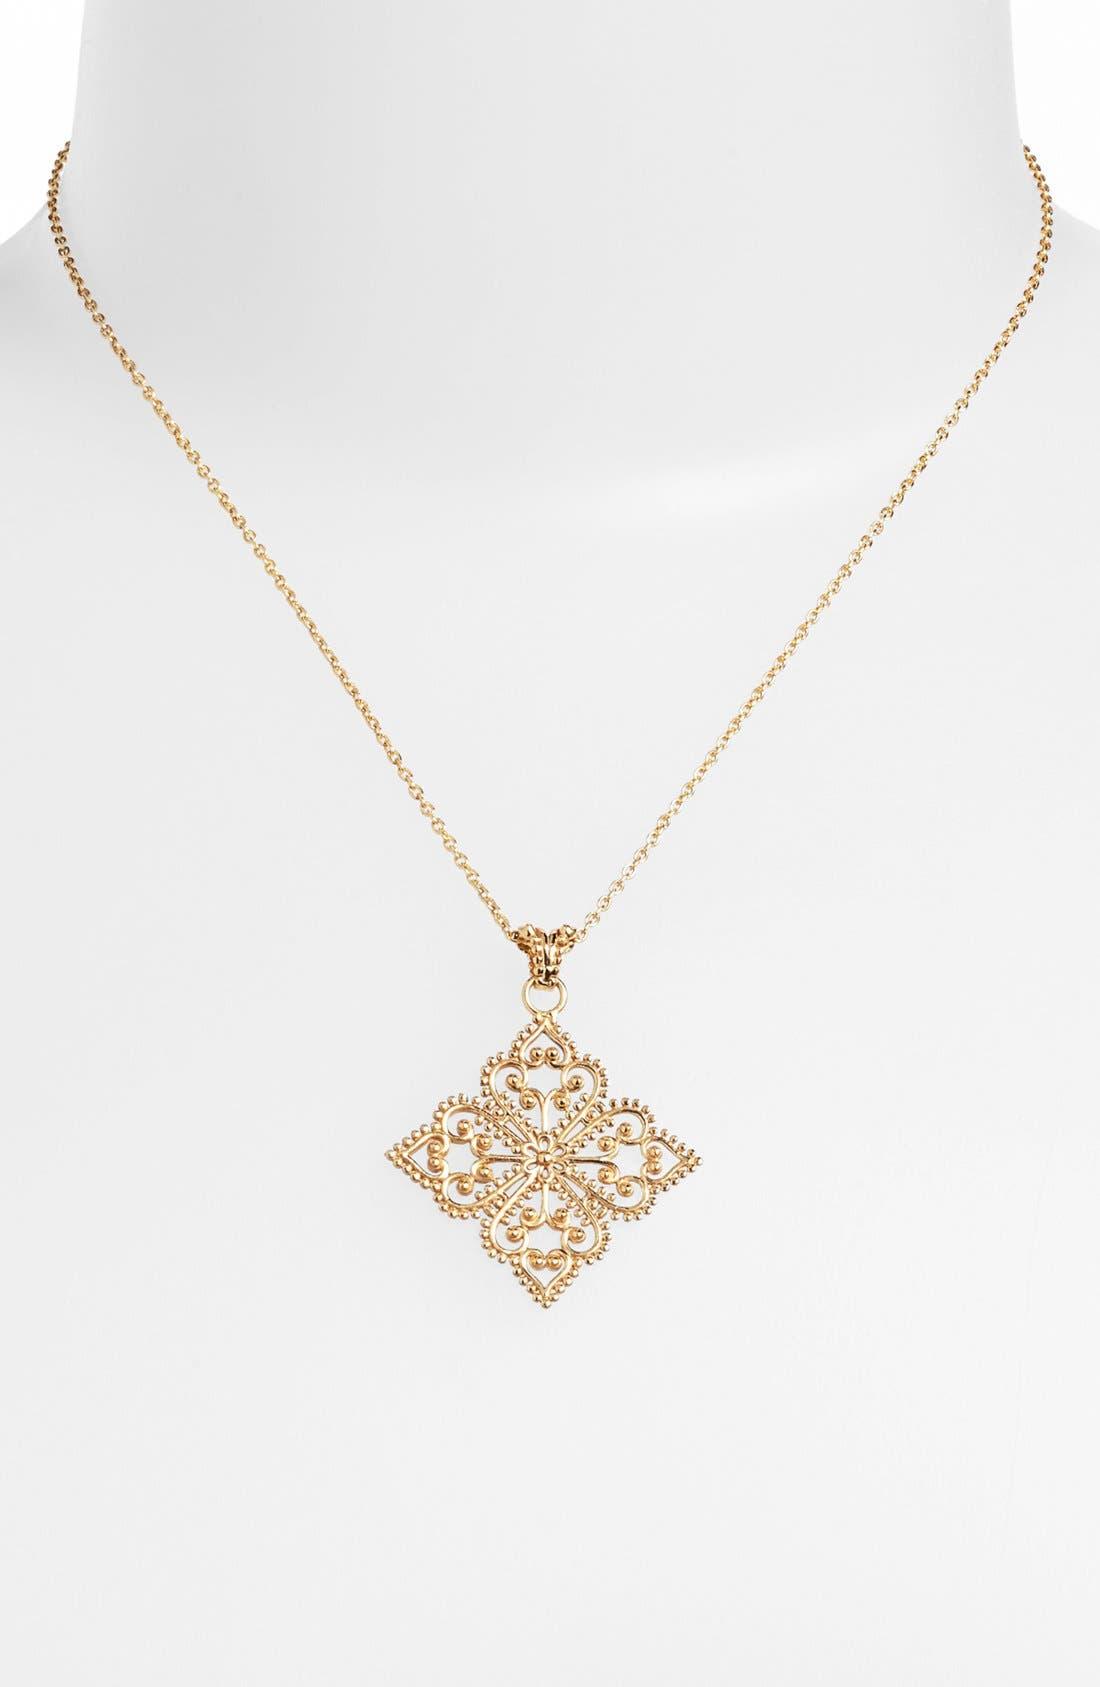 Alternate Image 1 Selected - Argento Vivo 'Anastasia' Pendant Necklace